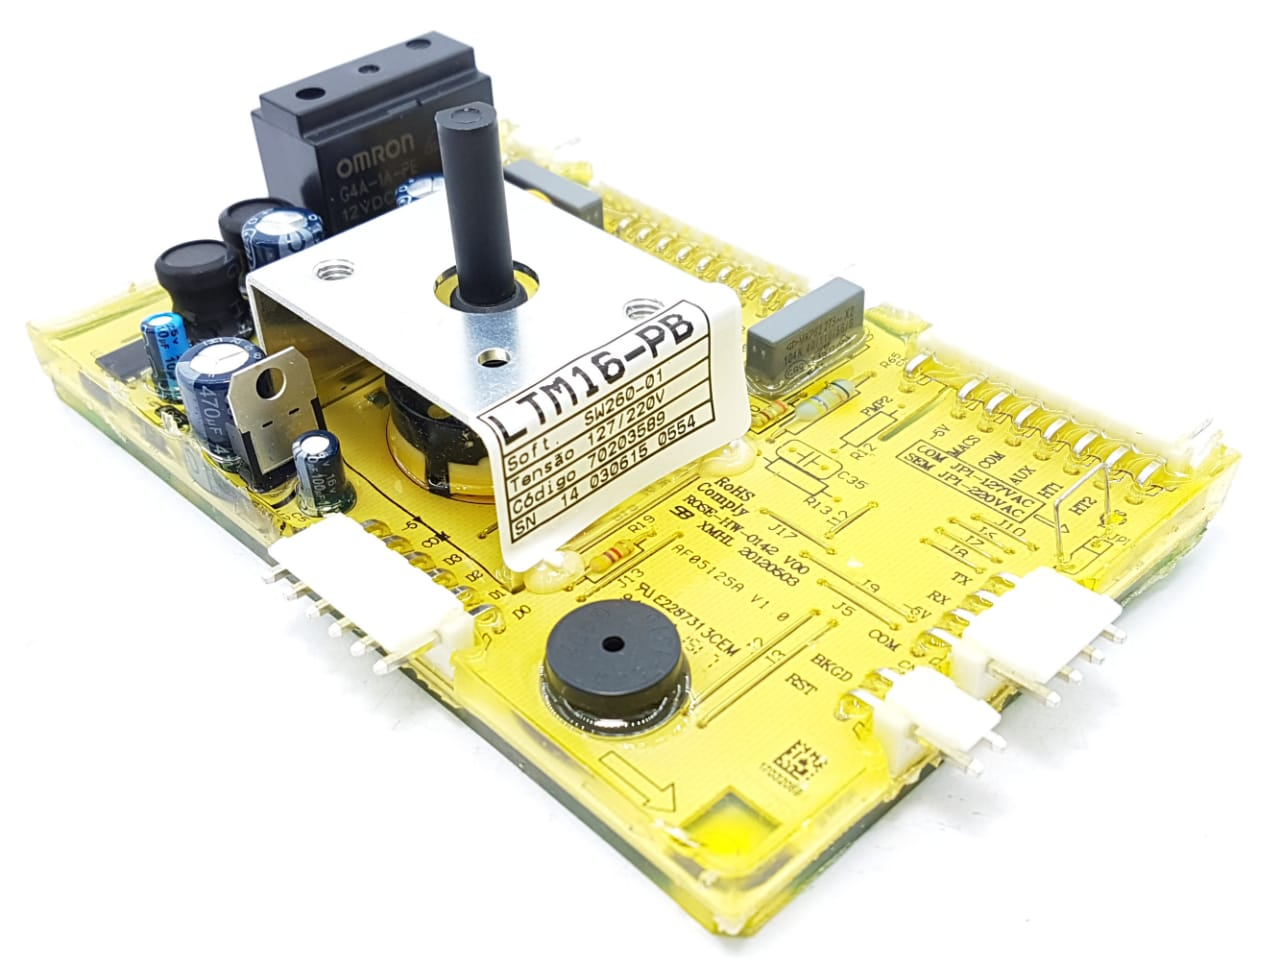 Placa Eletrônica Electrolux Ltm16 70203589 Original Bivolt